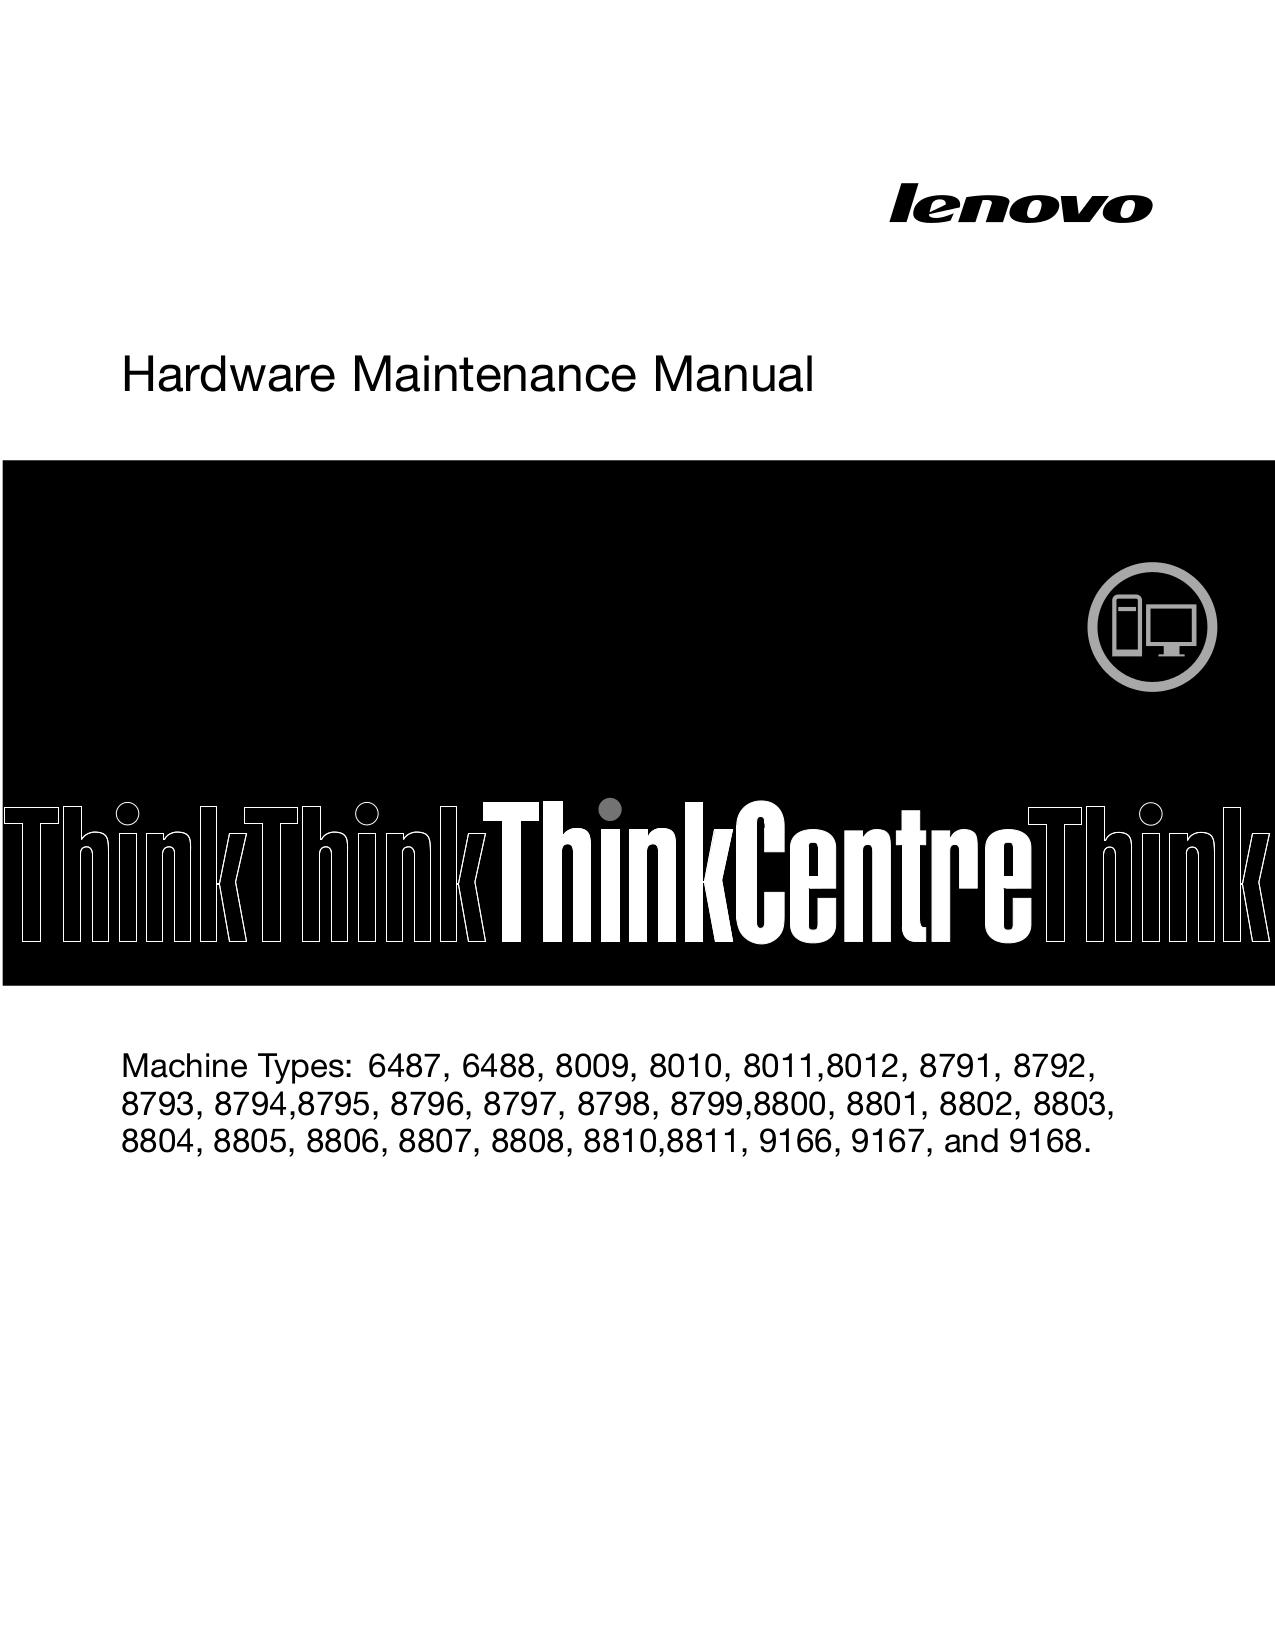 pdf for Lenovo Desktop ThinkCentre M55 9167 manual